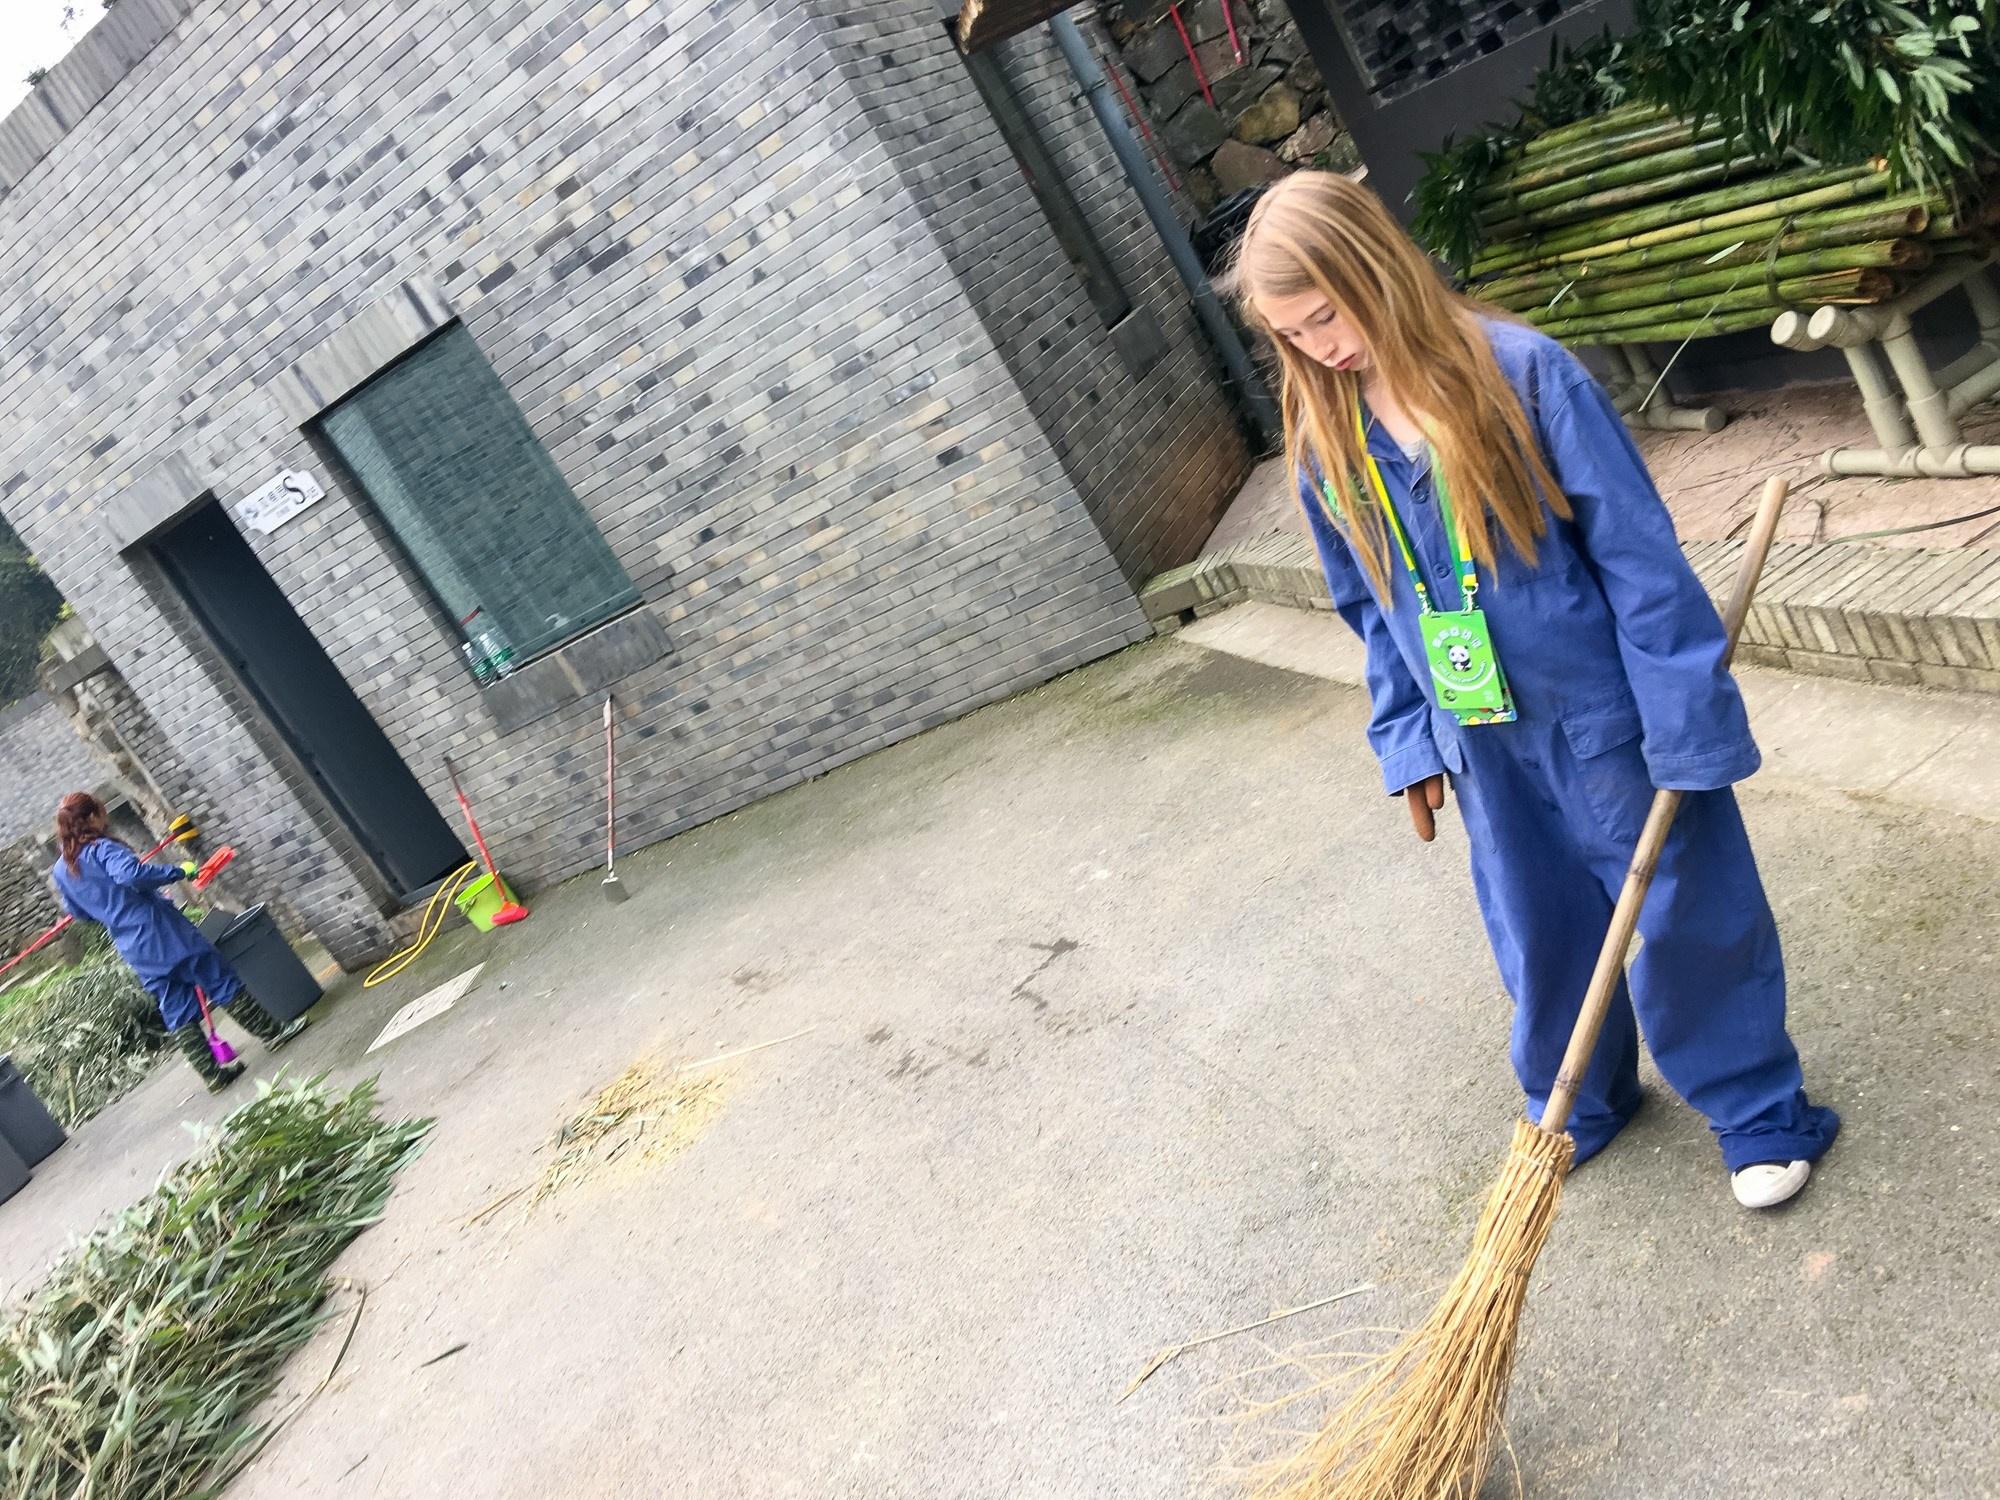 Sweeping the main area at Dujiangyan Panda Base